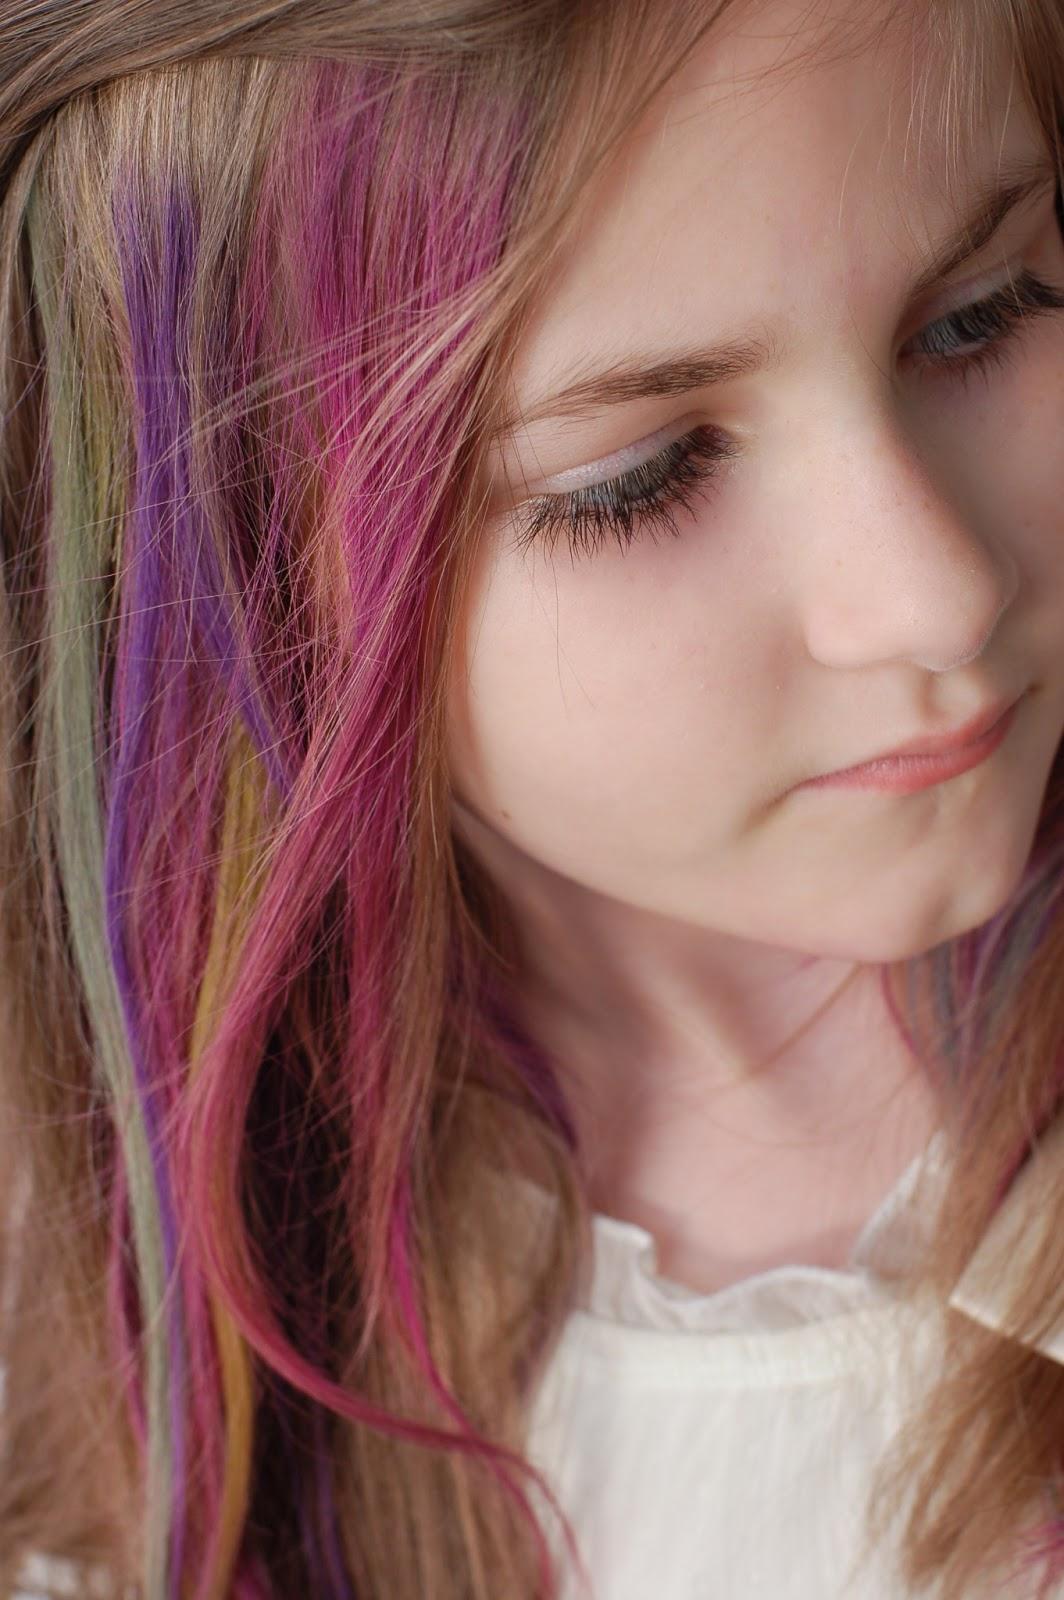 Most Natural Box Hair Dye